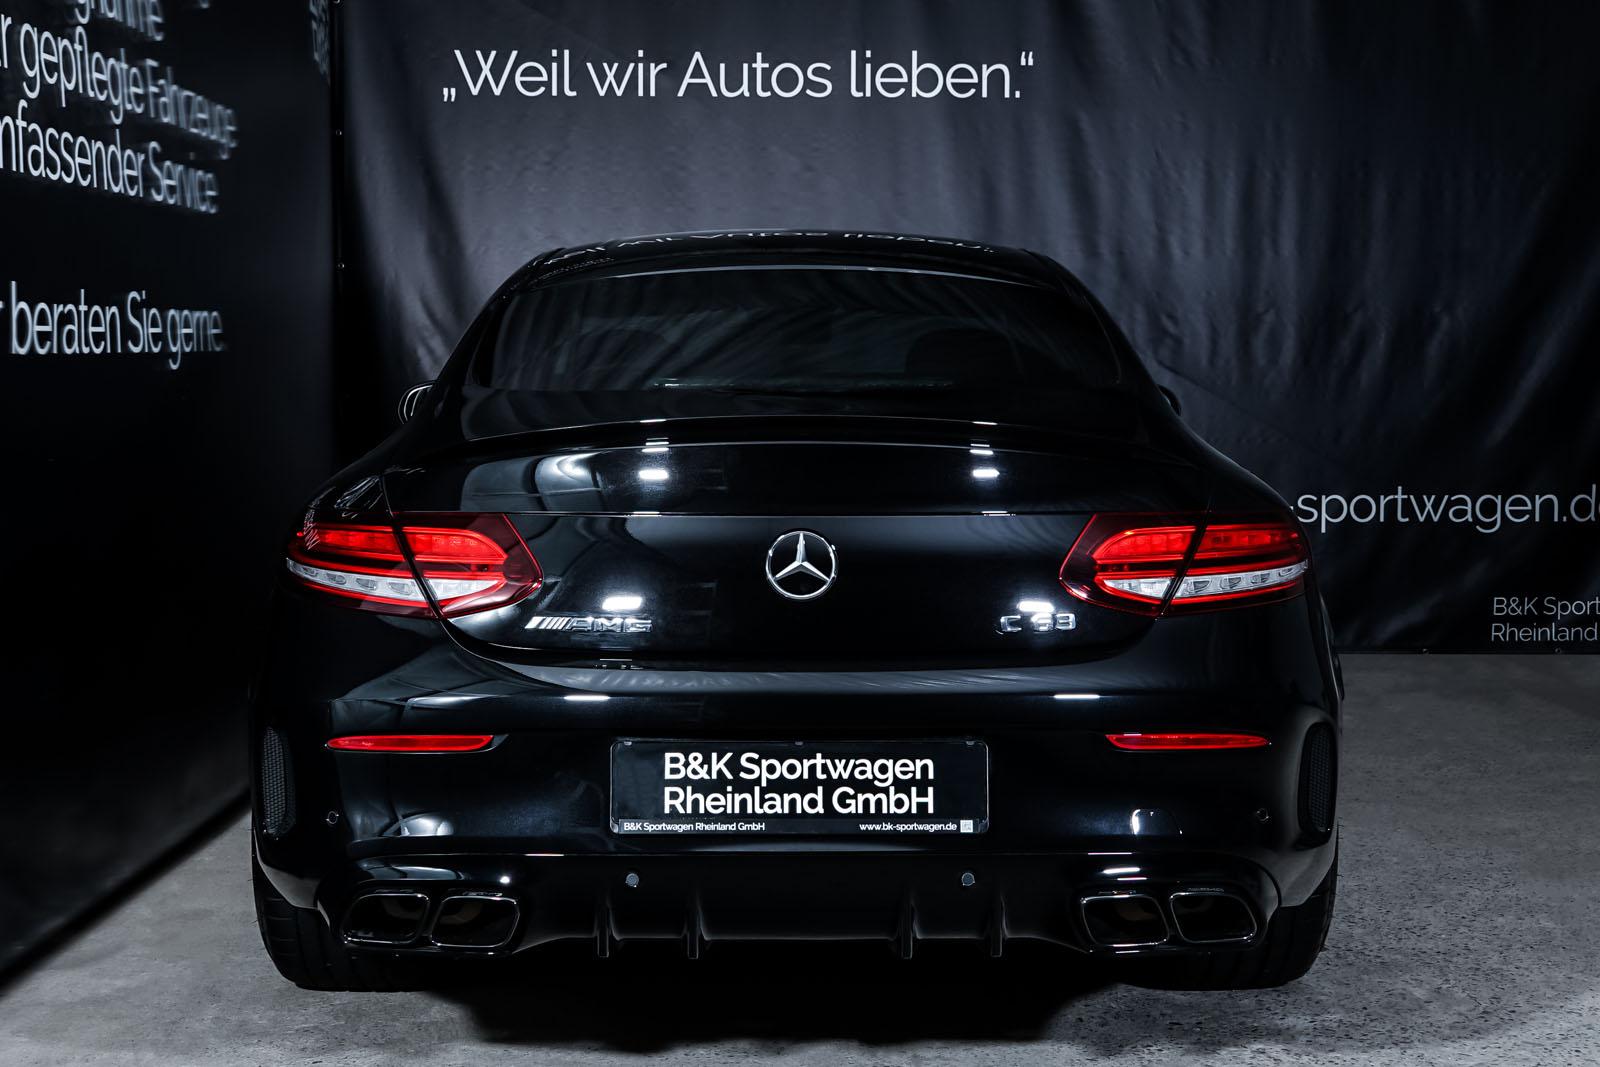 MercedesBenz_C63_AMG_Schwarz_Schwarz_MB-5973_7_w